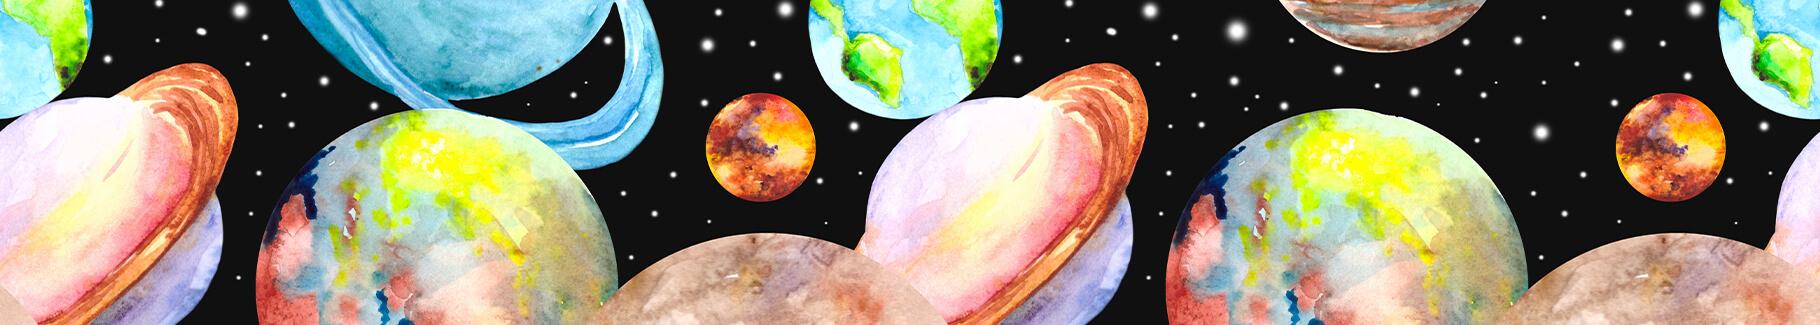 Plakat planety na niebie